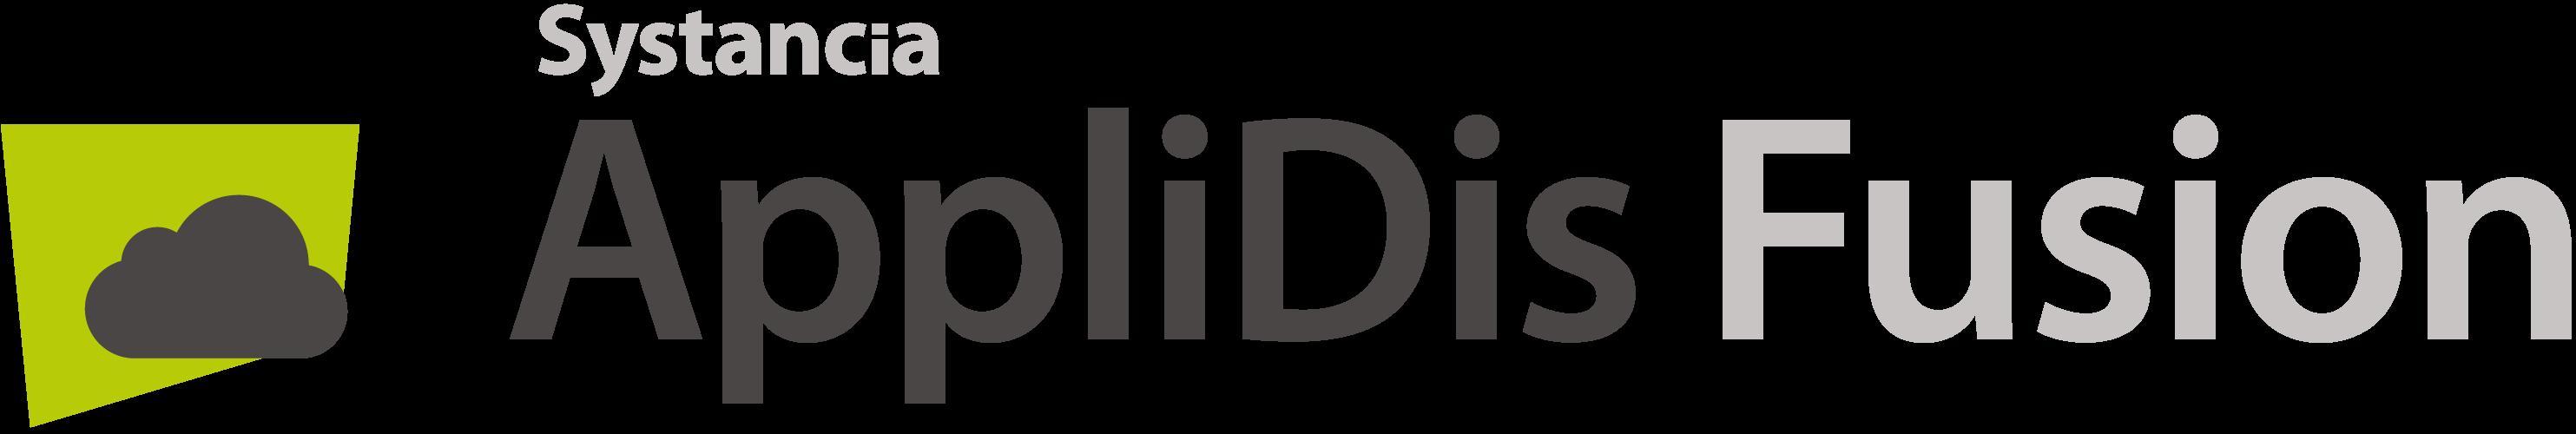 logo applidisFusion gris